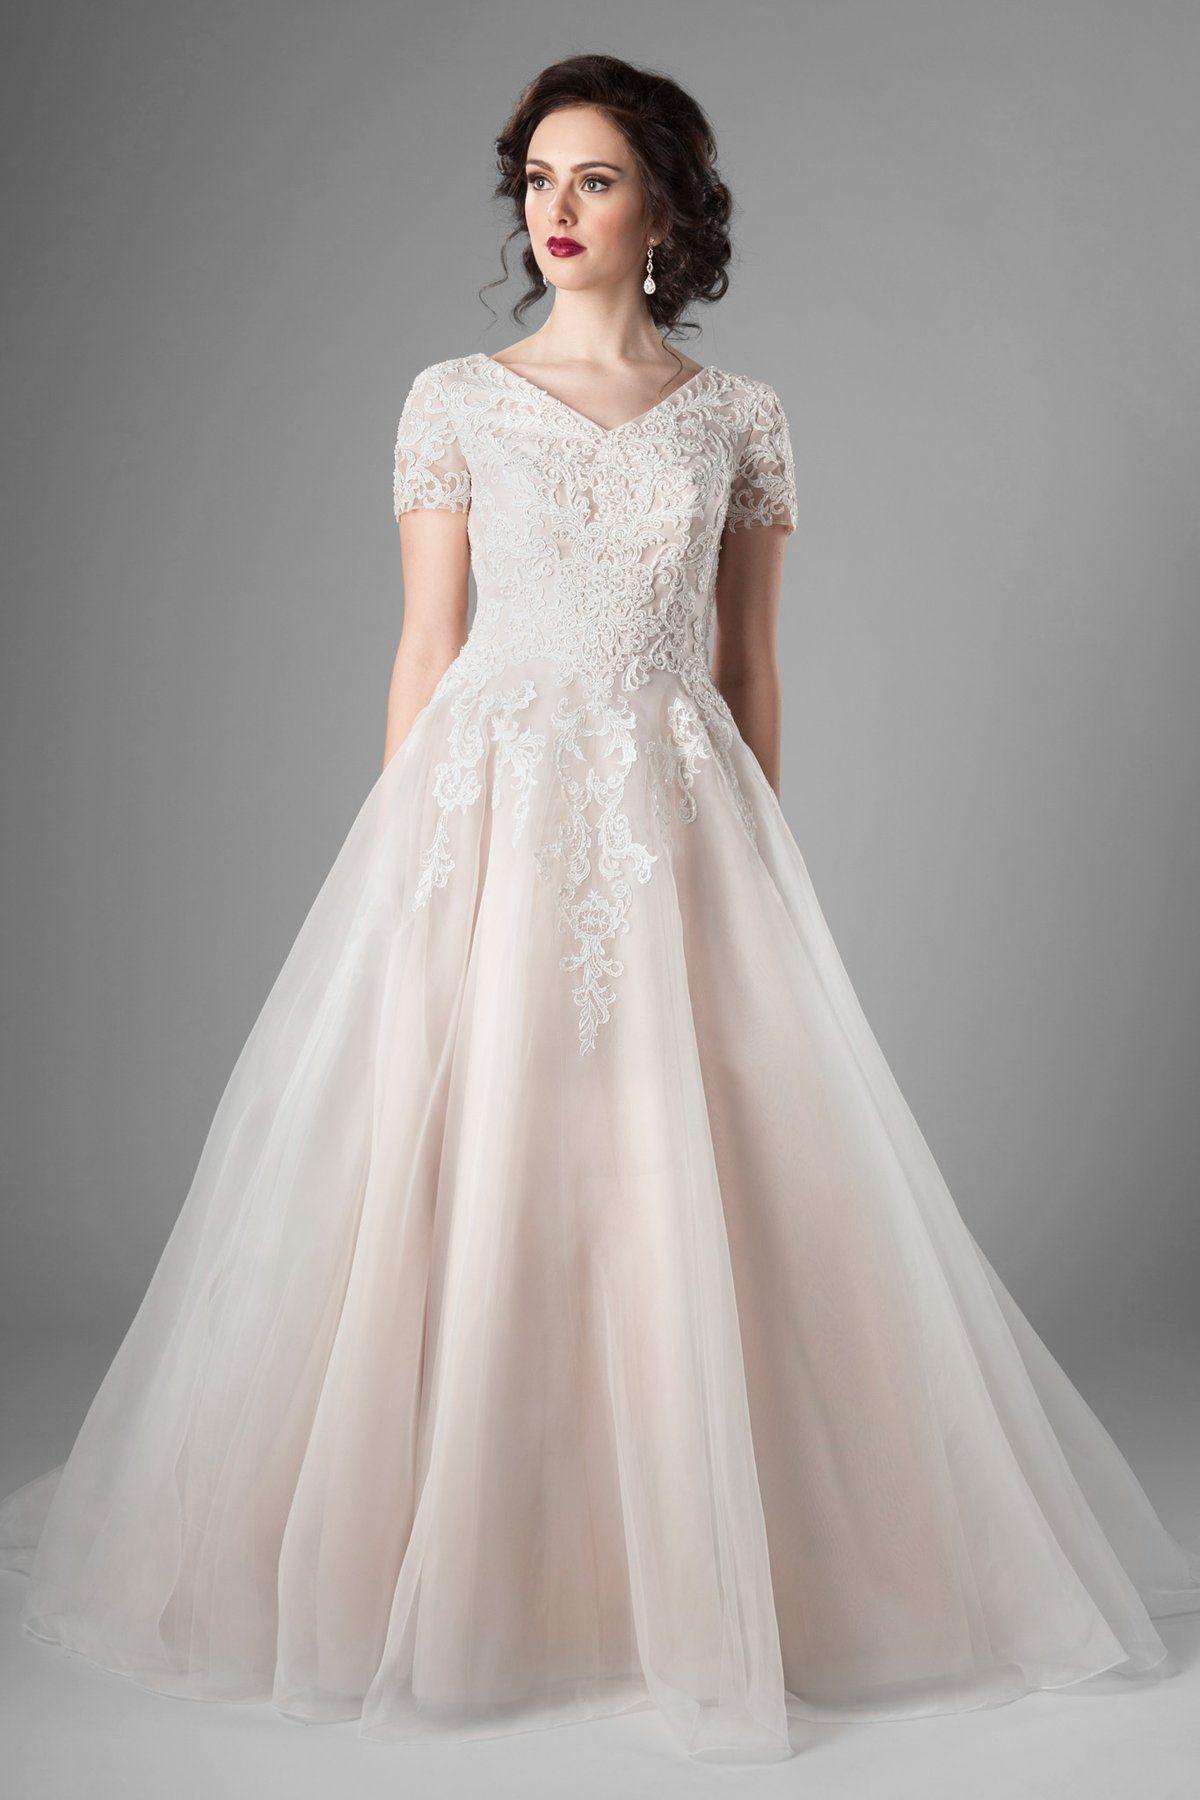 Wedding Dresses Utah.Sorrento Wedding Dresses In 2019 Modest Wedding Dresses Dresses